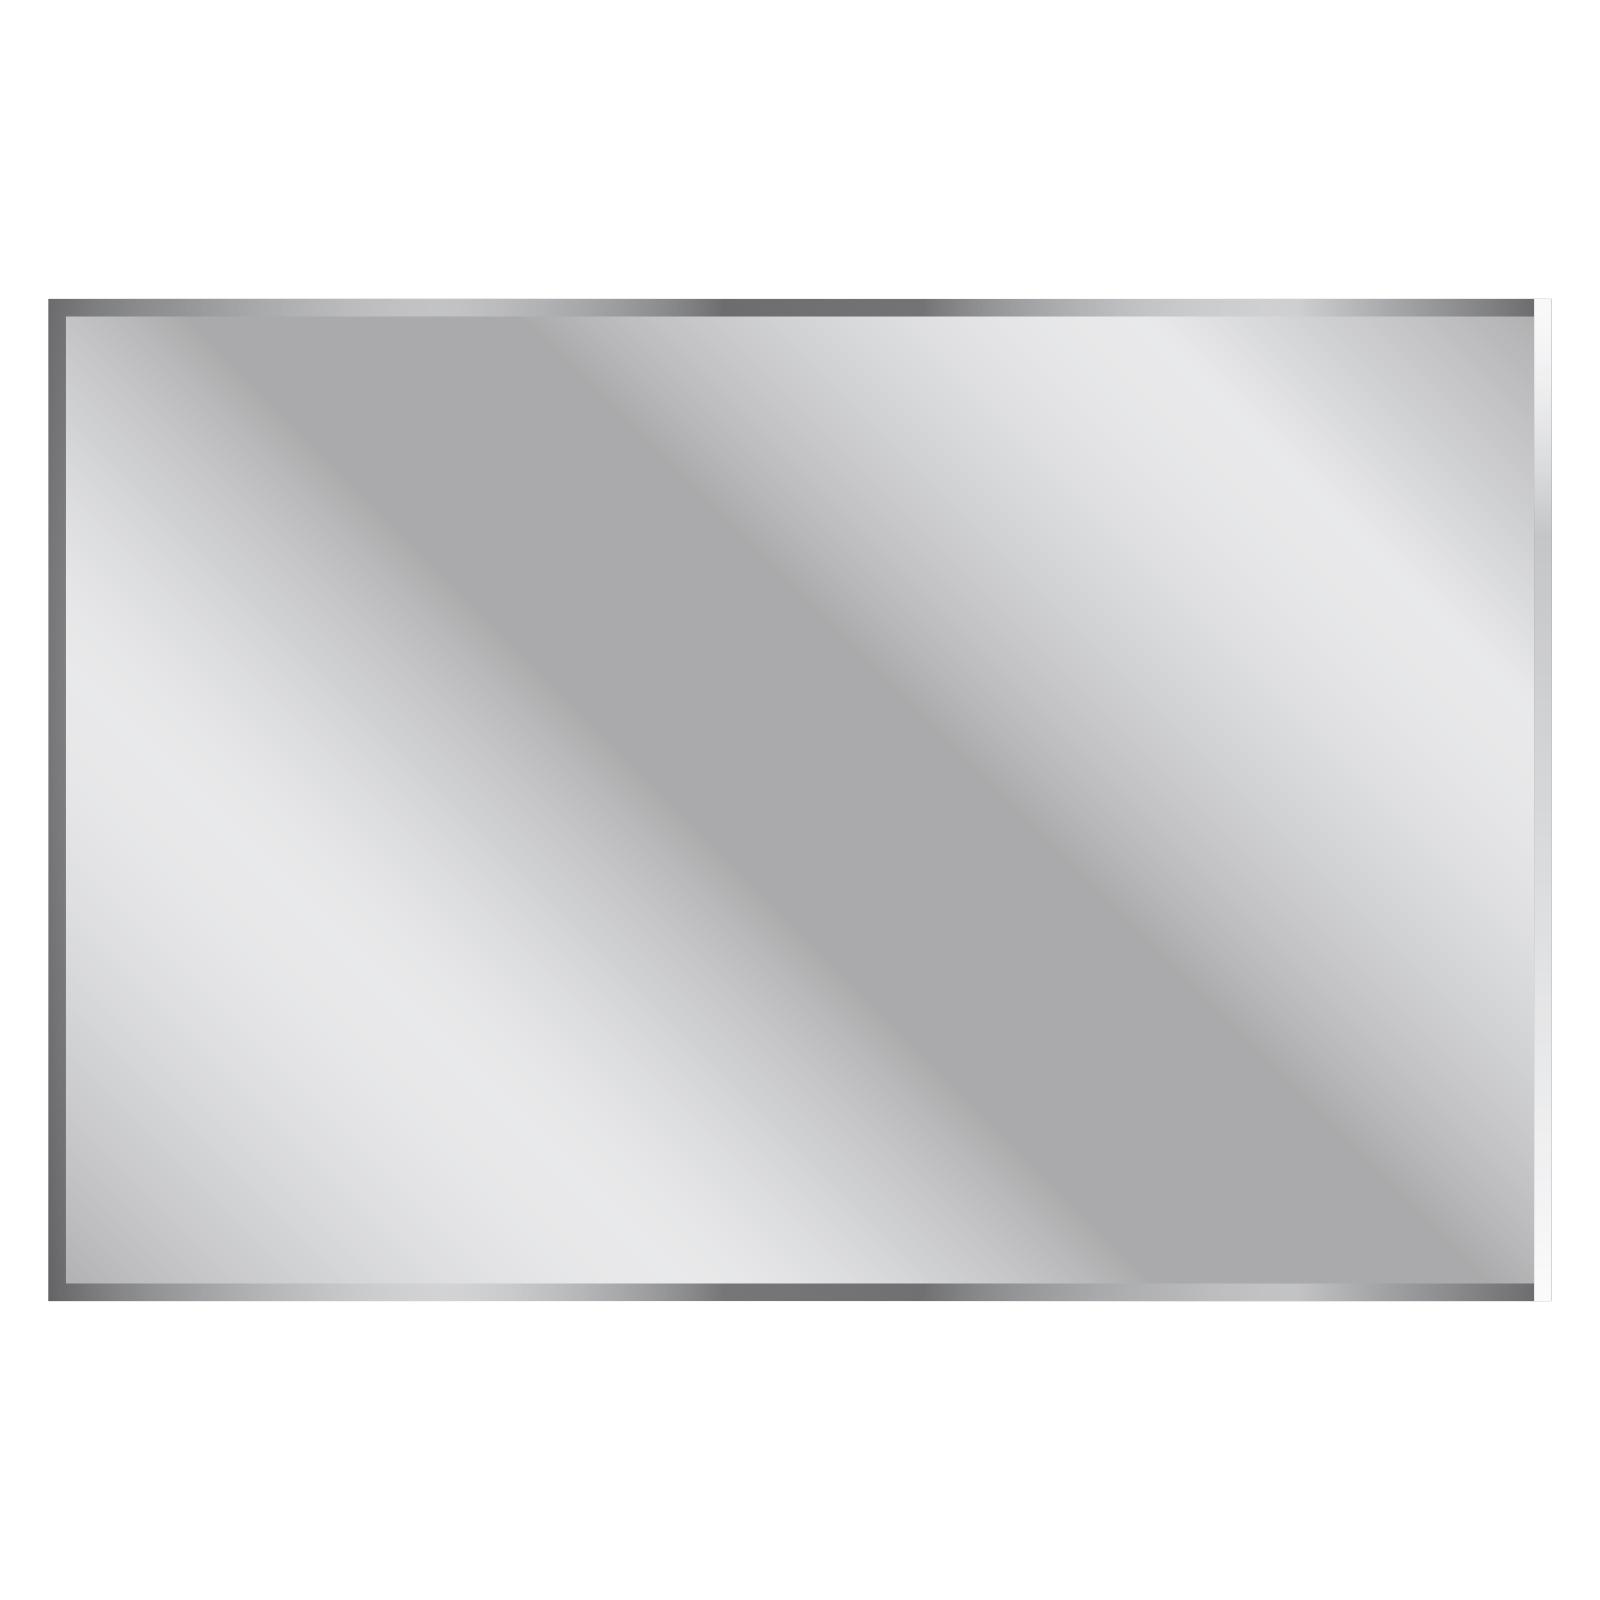 Living Elements 600 x 900 x 5mm Bevel Edge Mirror